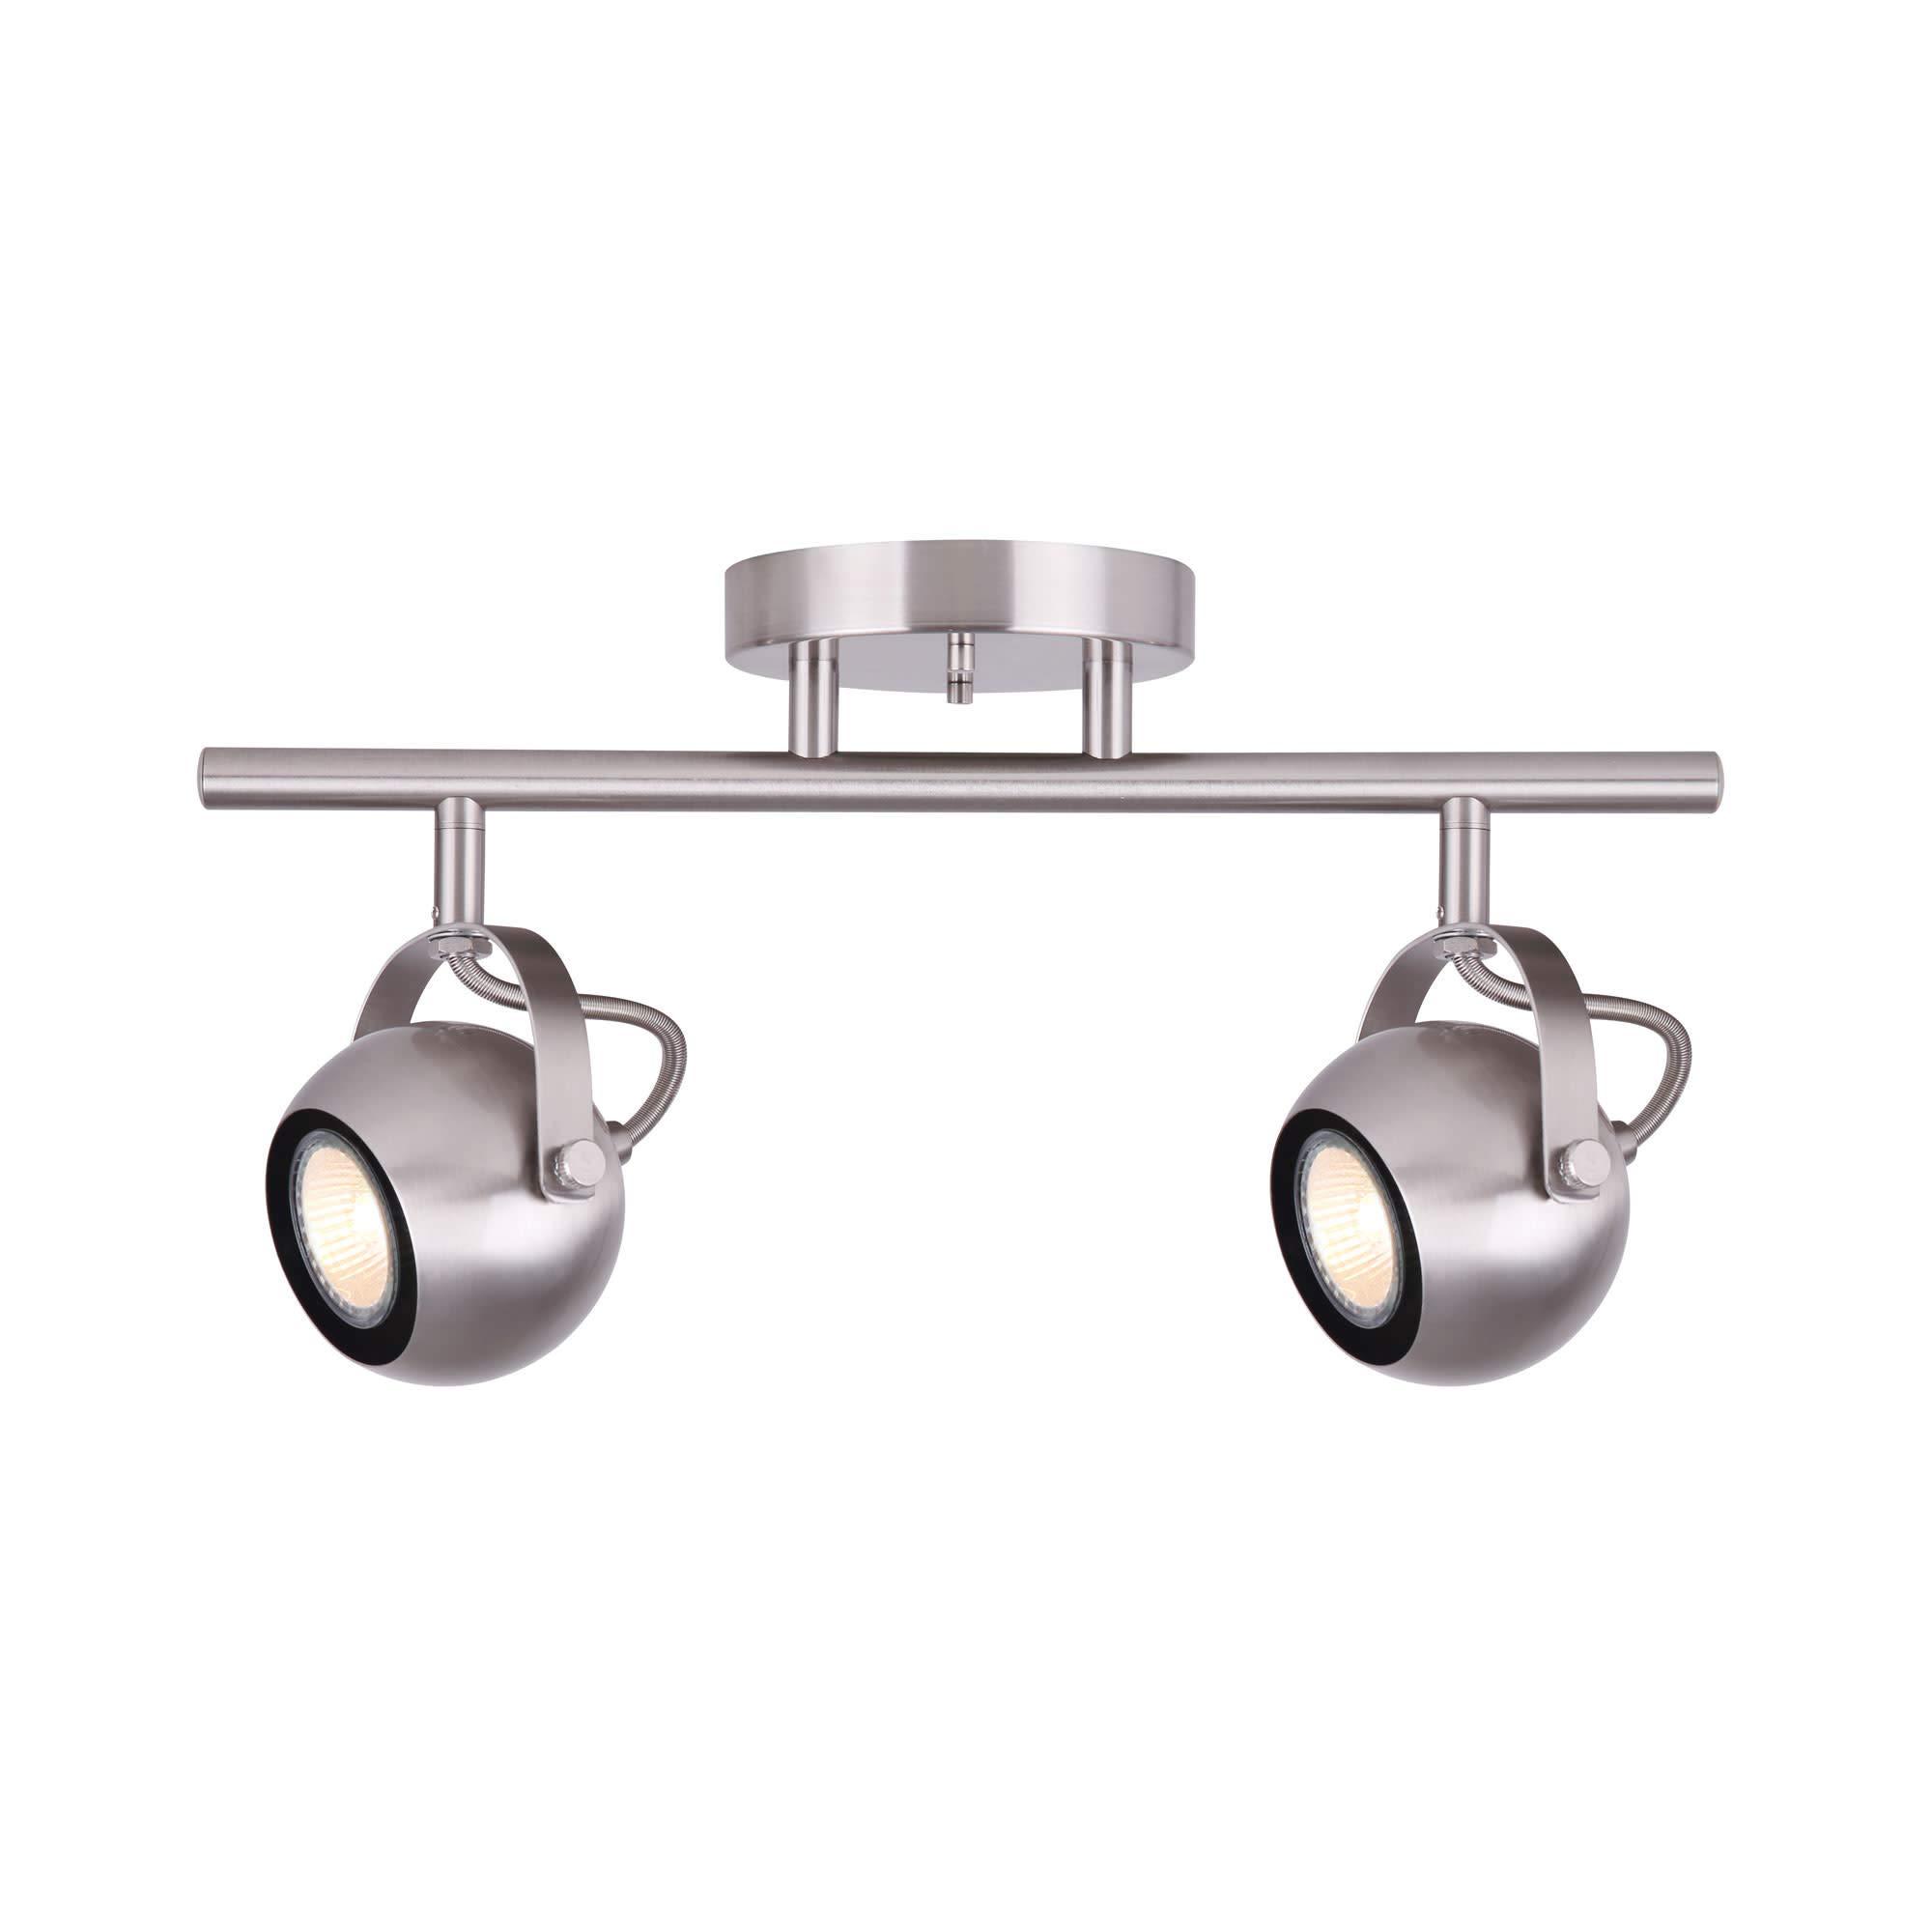 Canarm IT743A02BN10 MURPHY Ceiling/Wall Mount Track light Nickel